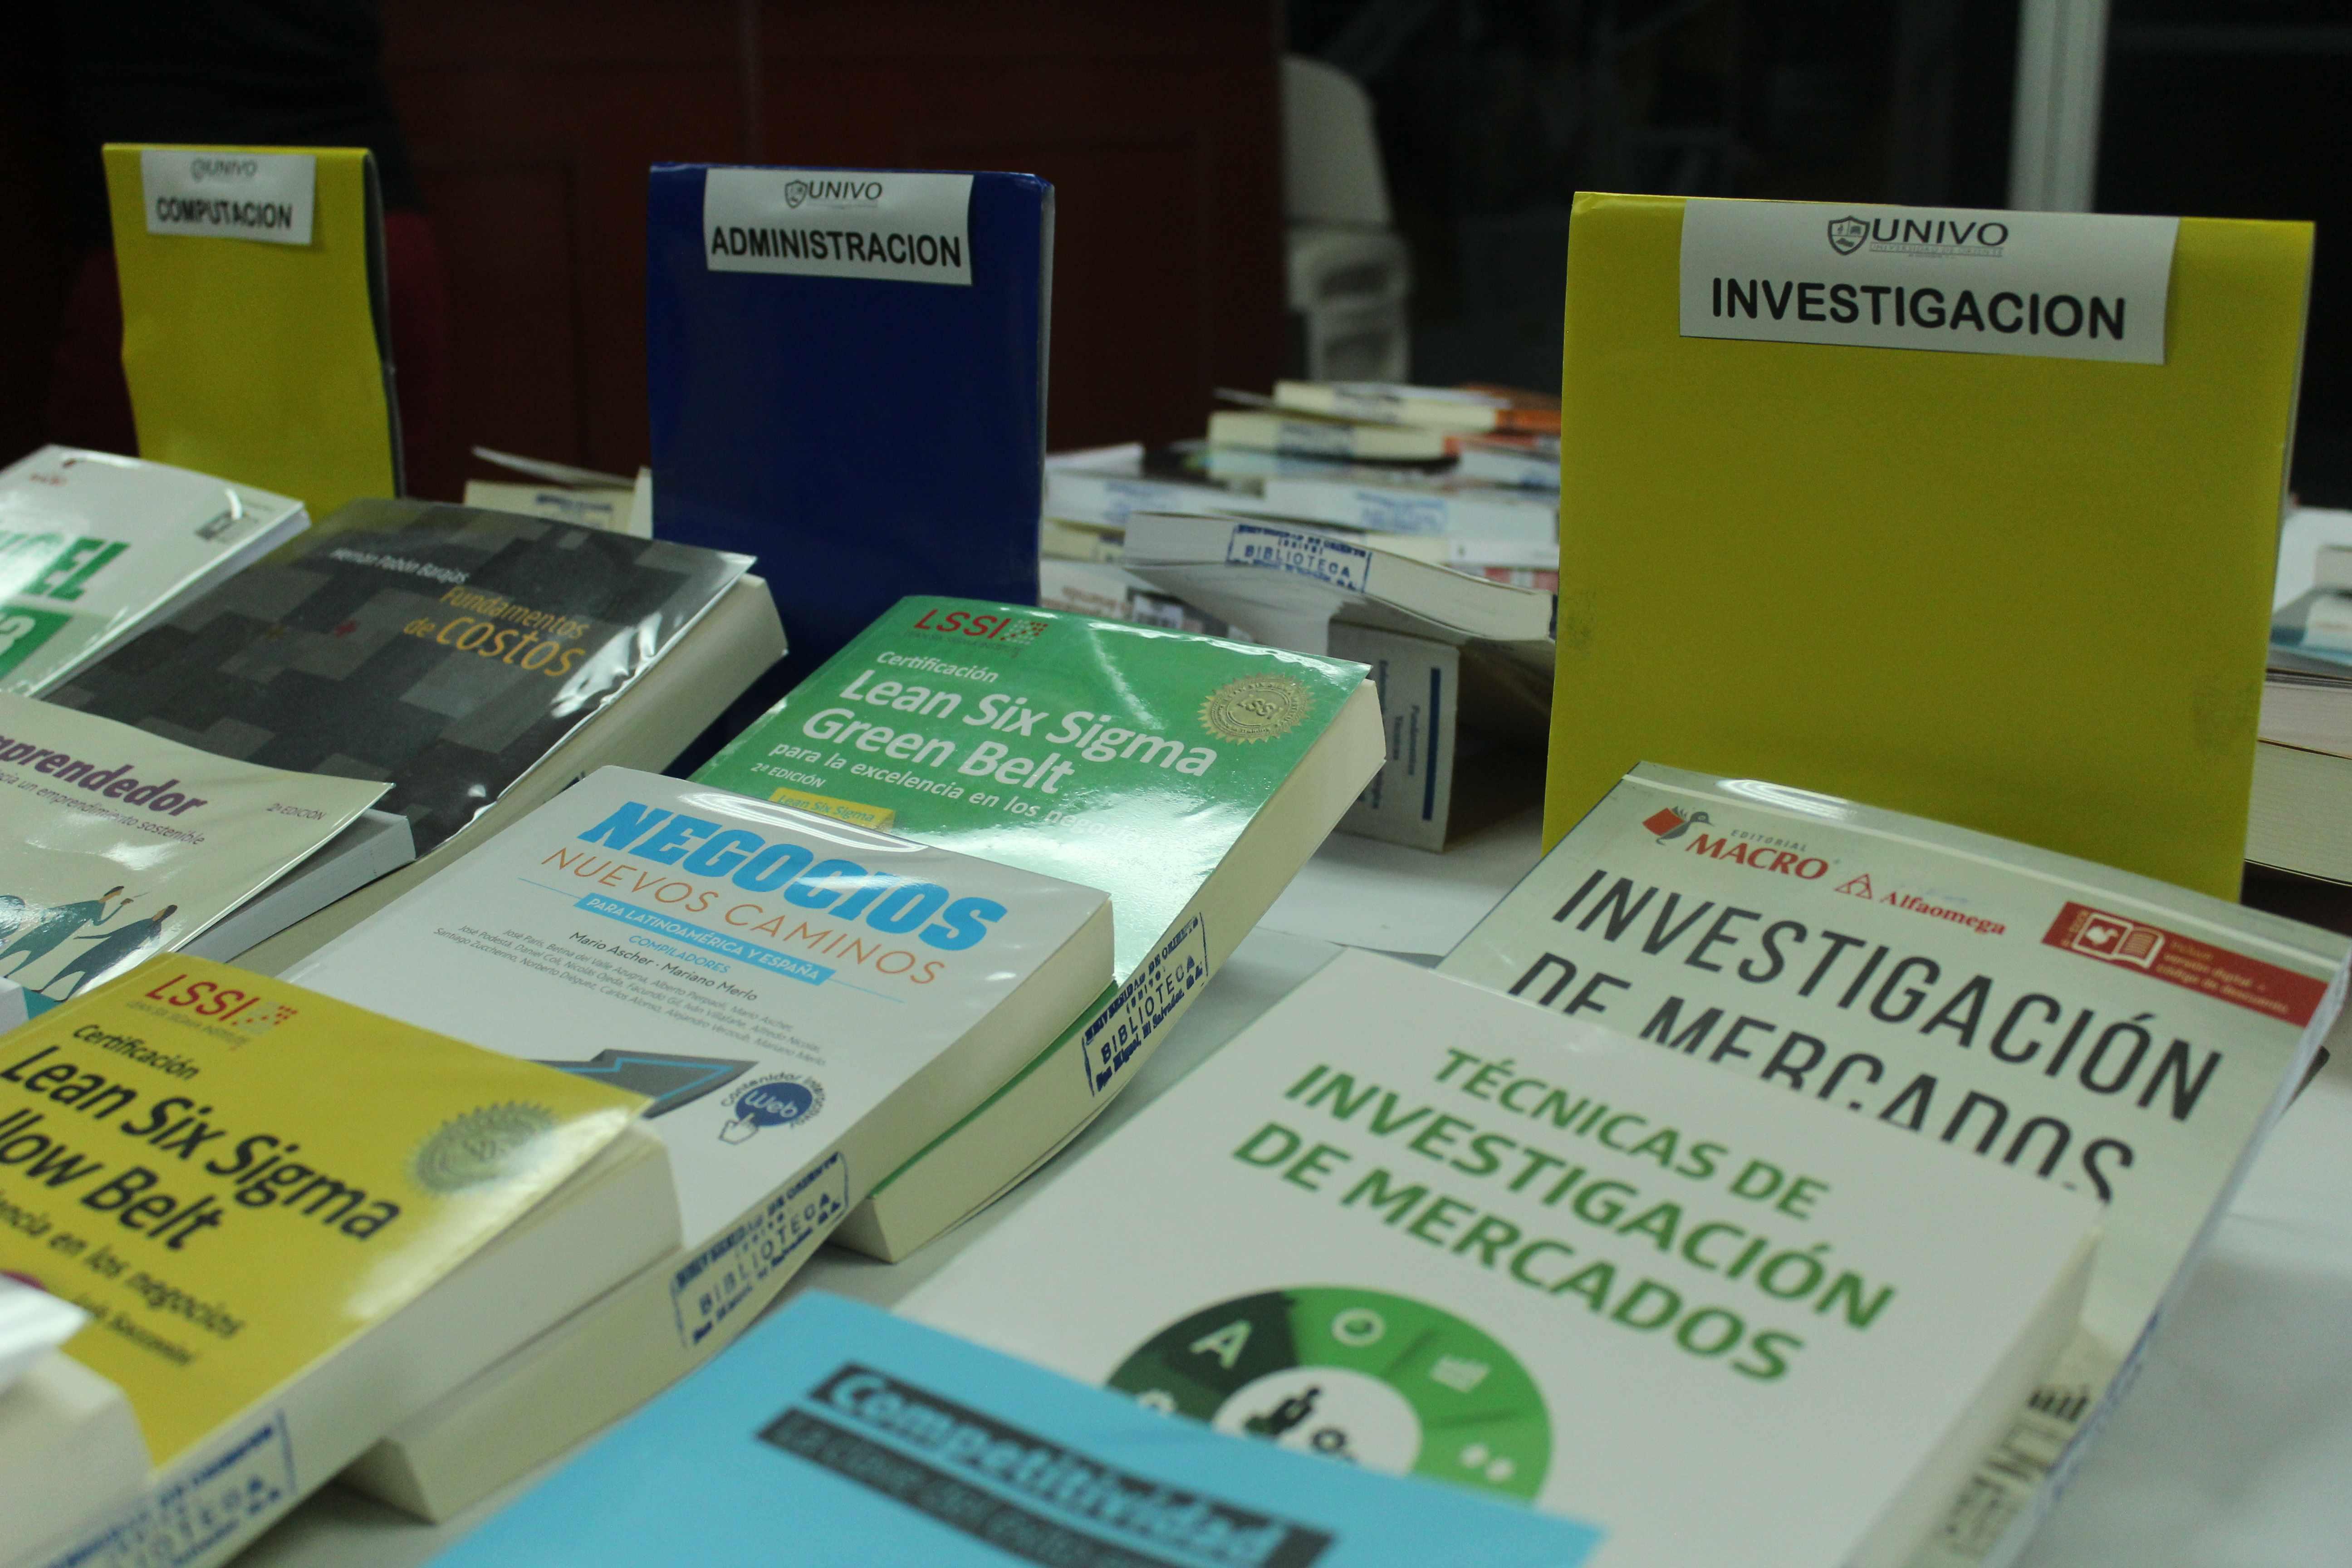 Biblioteca UNIVO a la vanguardia con la tecnología